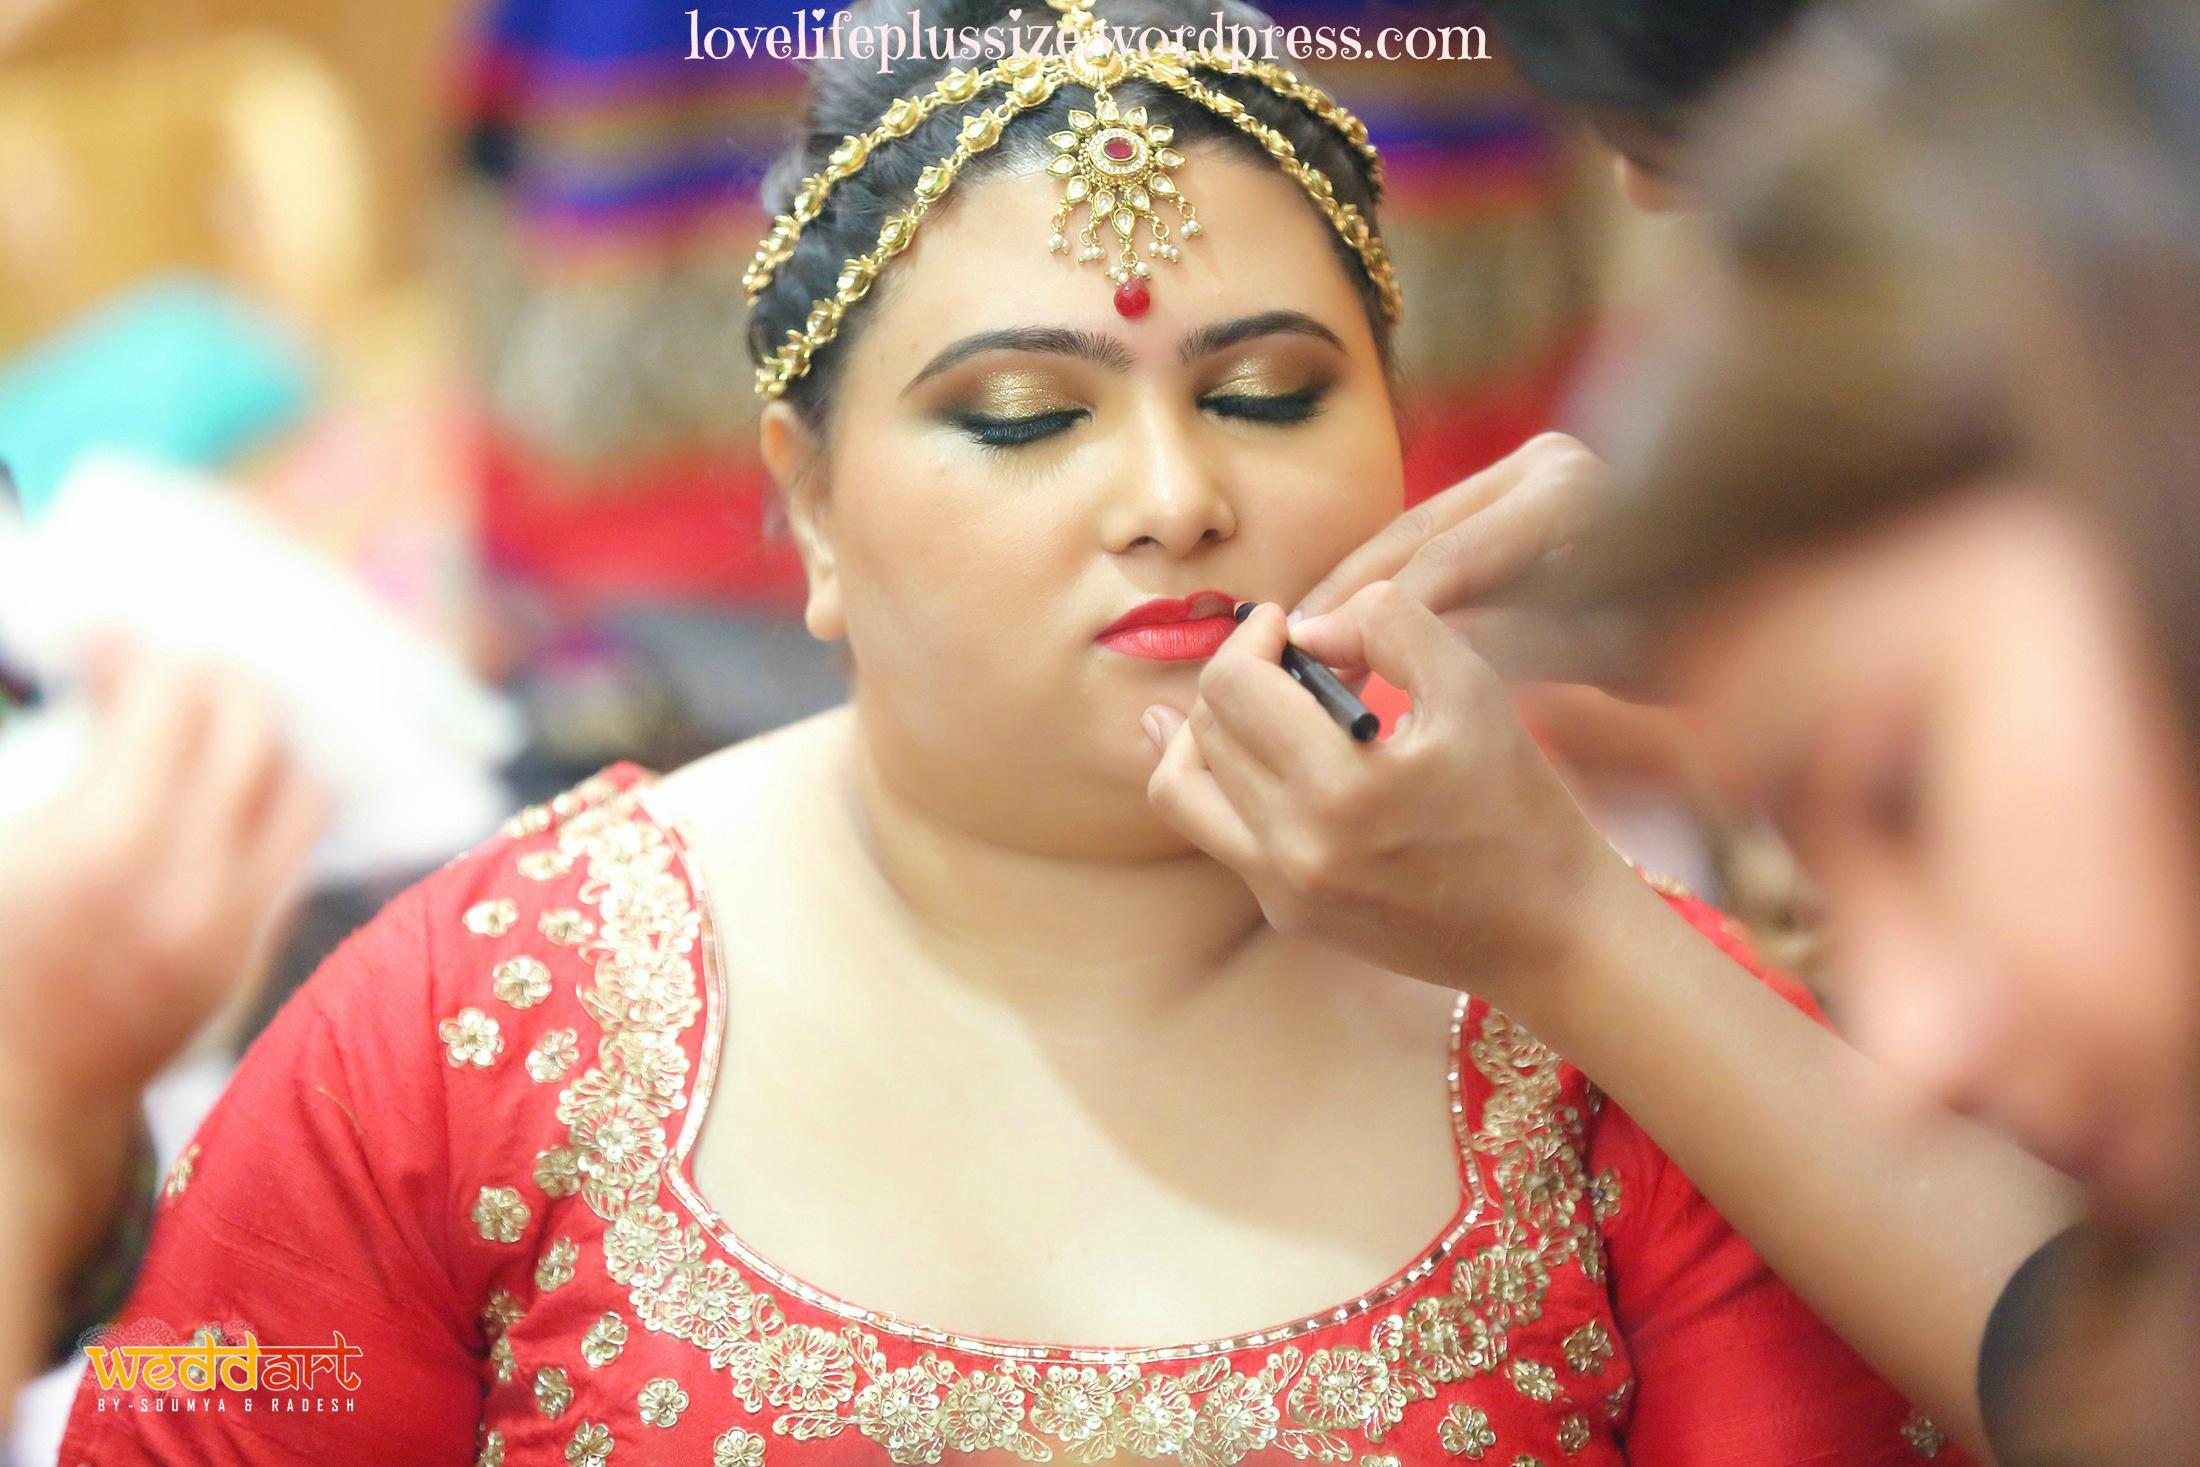 matha patti – love life plus size